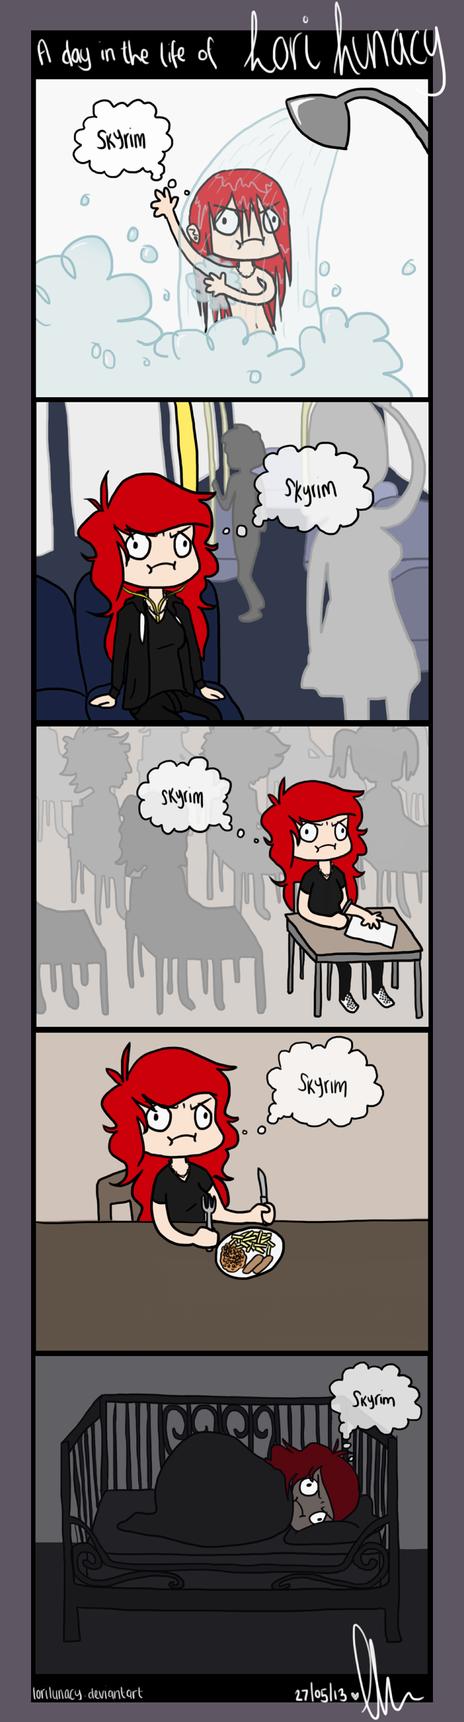 Skyrim = life by loriLUNACY